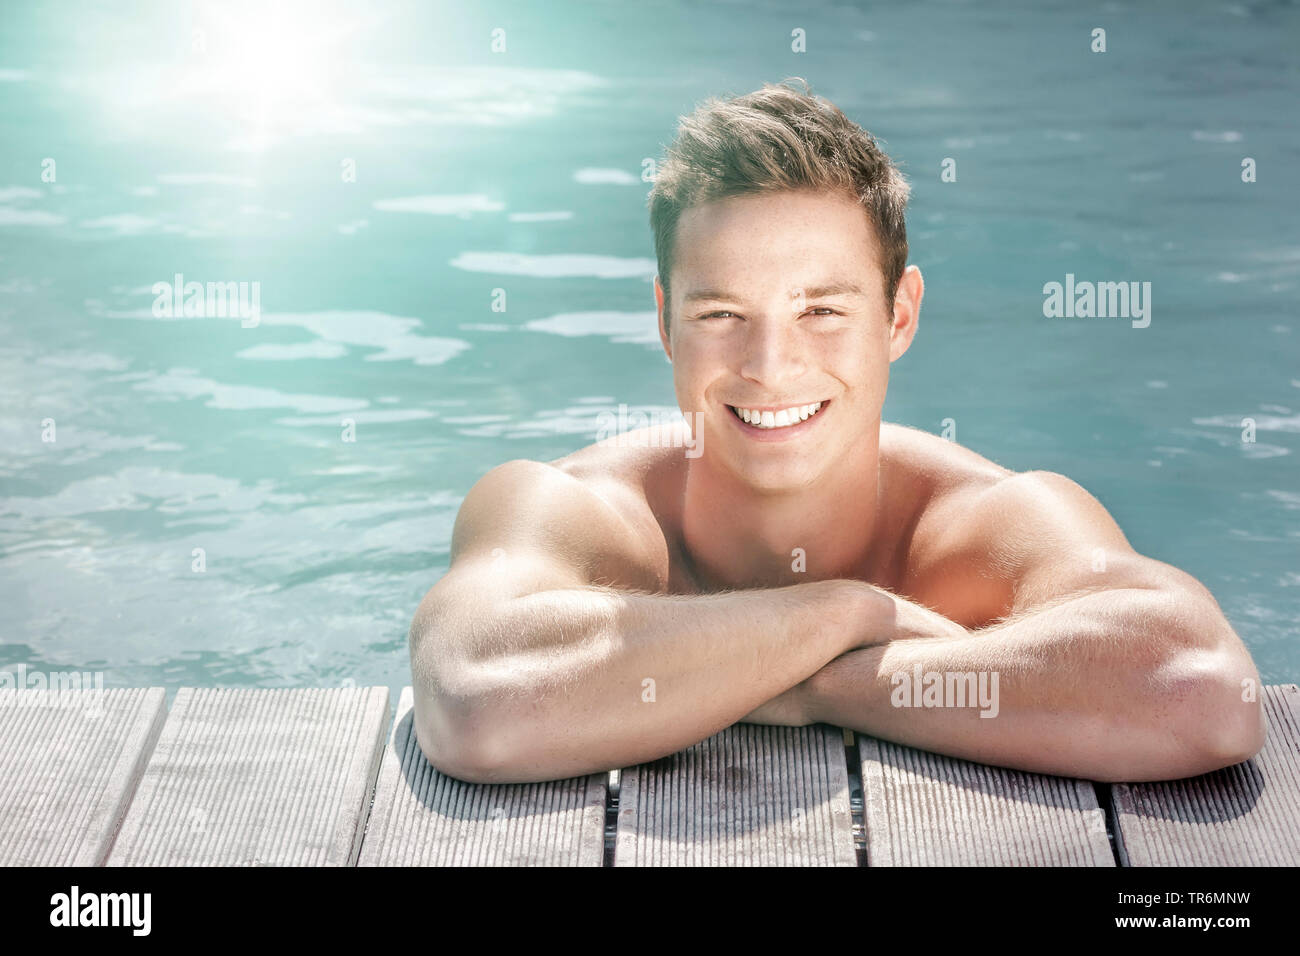 junger Mann am Rand eines Schwimmbeckens, Deutschland | young man in a swimming pool, Germany | BLWS487226.jpg [ (c) blickwinkel/McPHOTO/M. Gann Tel. - Stock Image